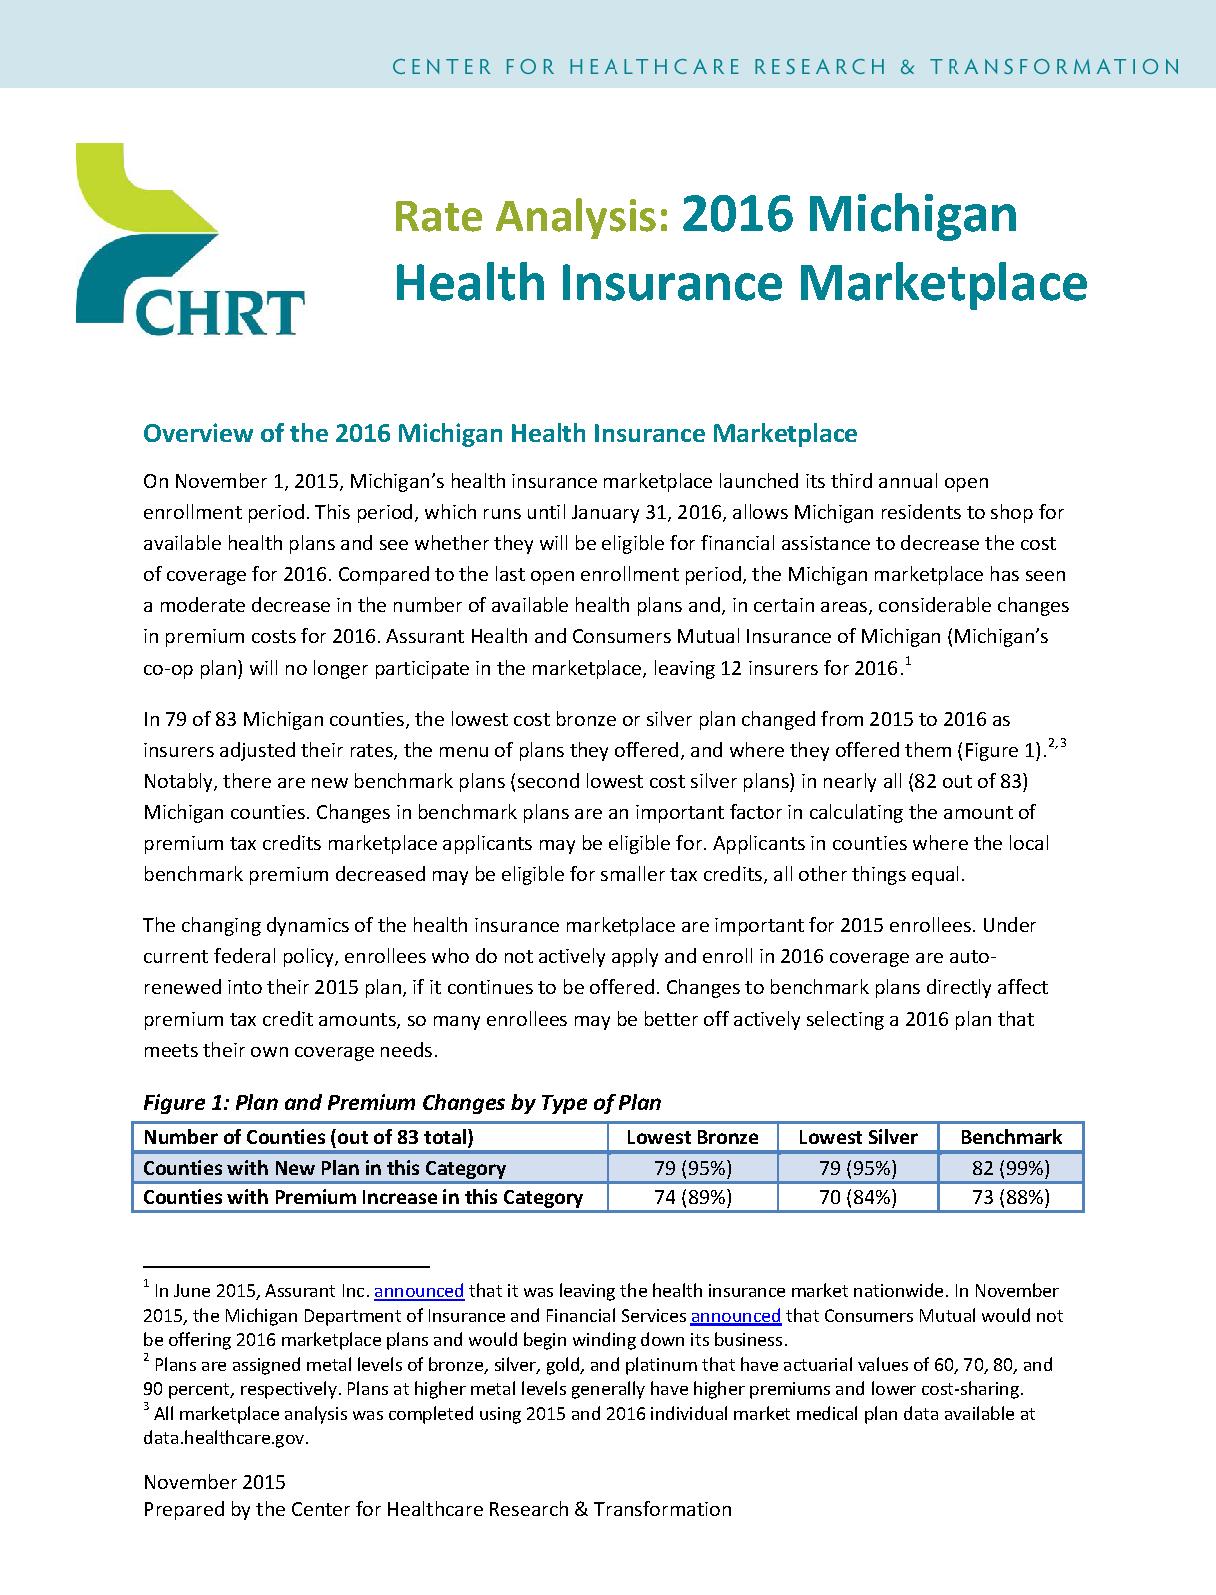 Rate Analysis: 2016 Michigan Health Insurance Marketplace